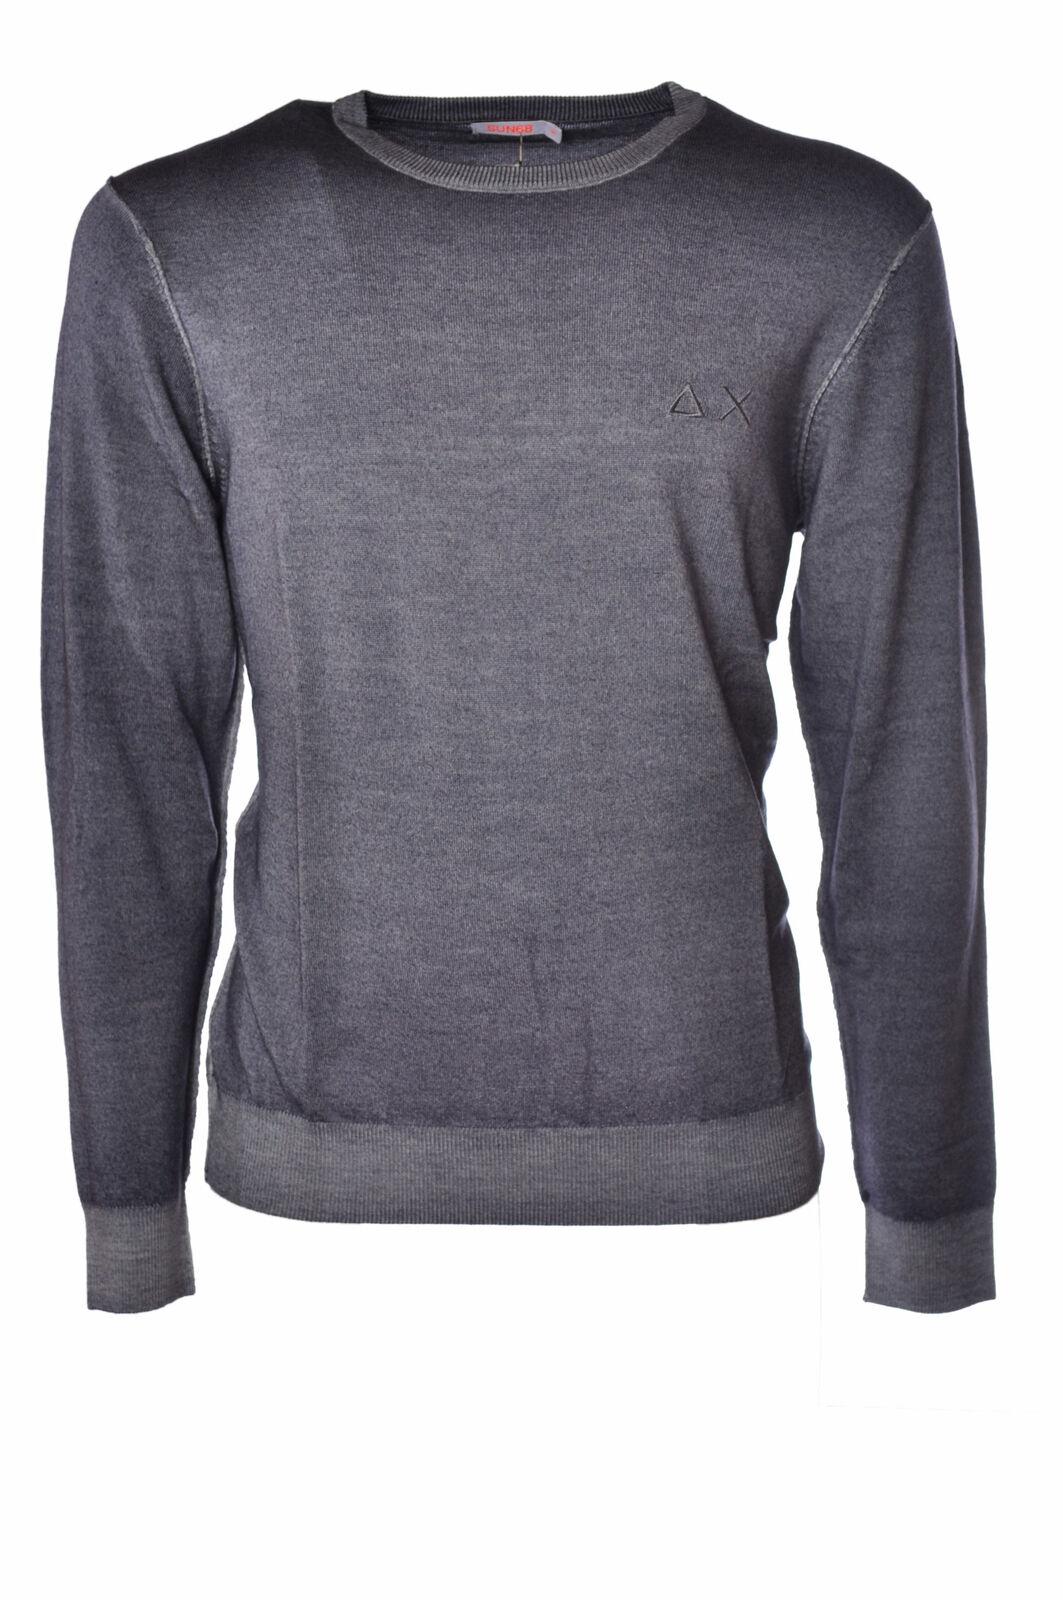 Sun 68  -  Sweaters - Male - Grau - 2514226N173332